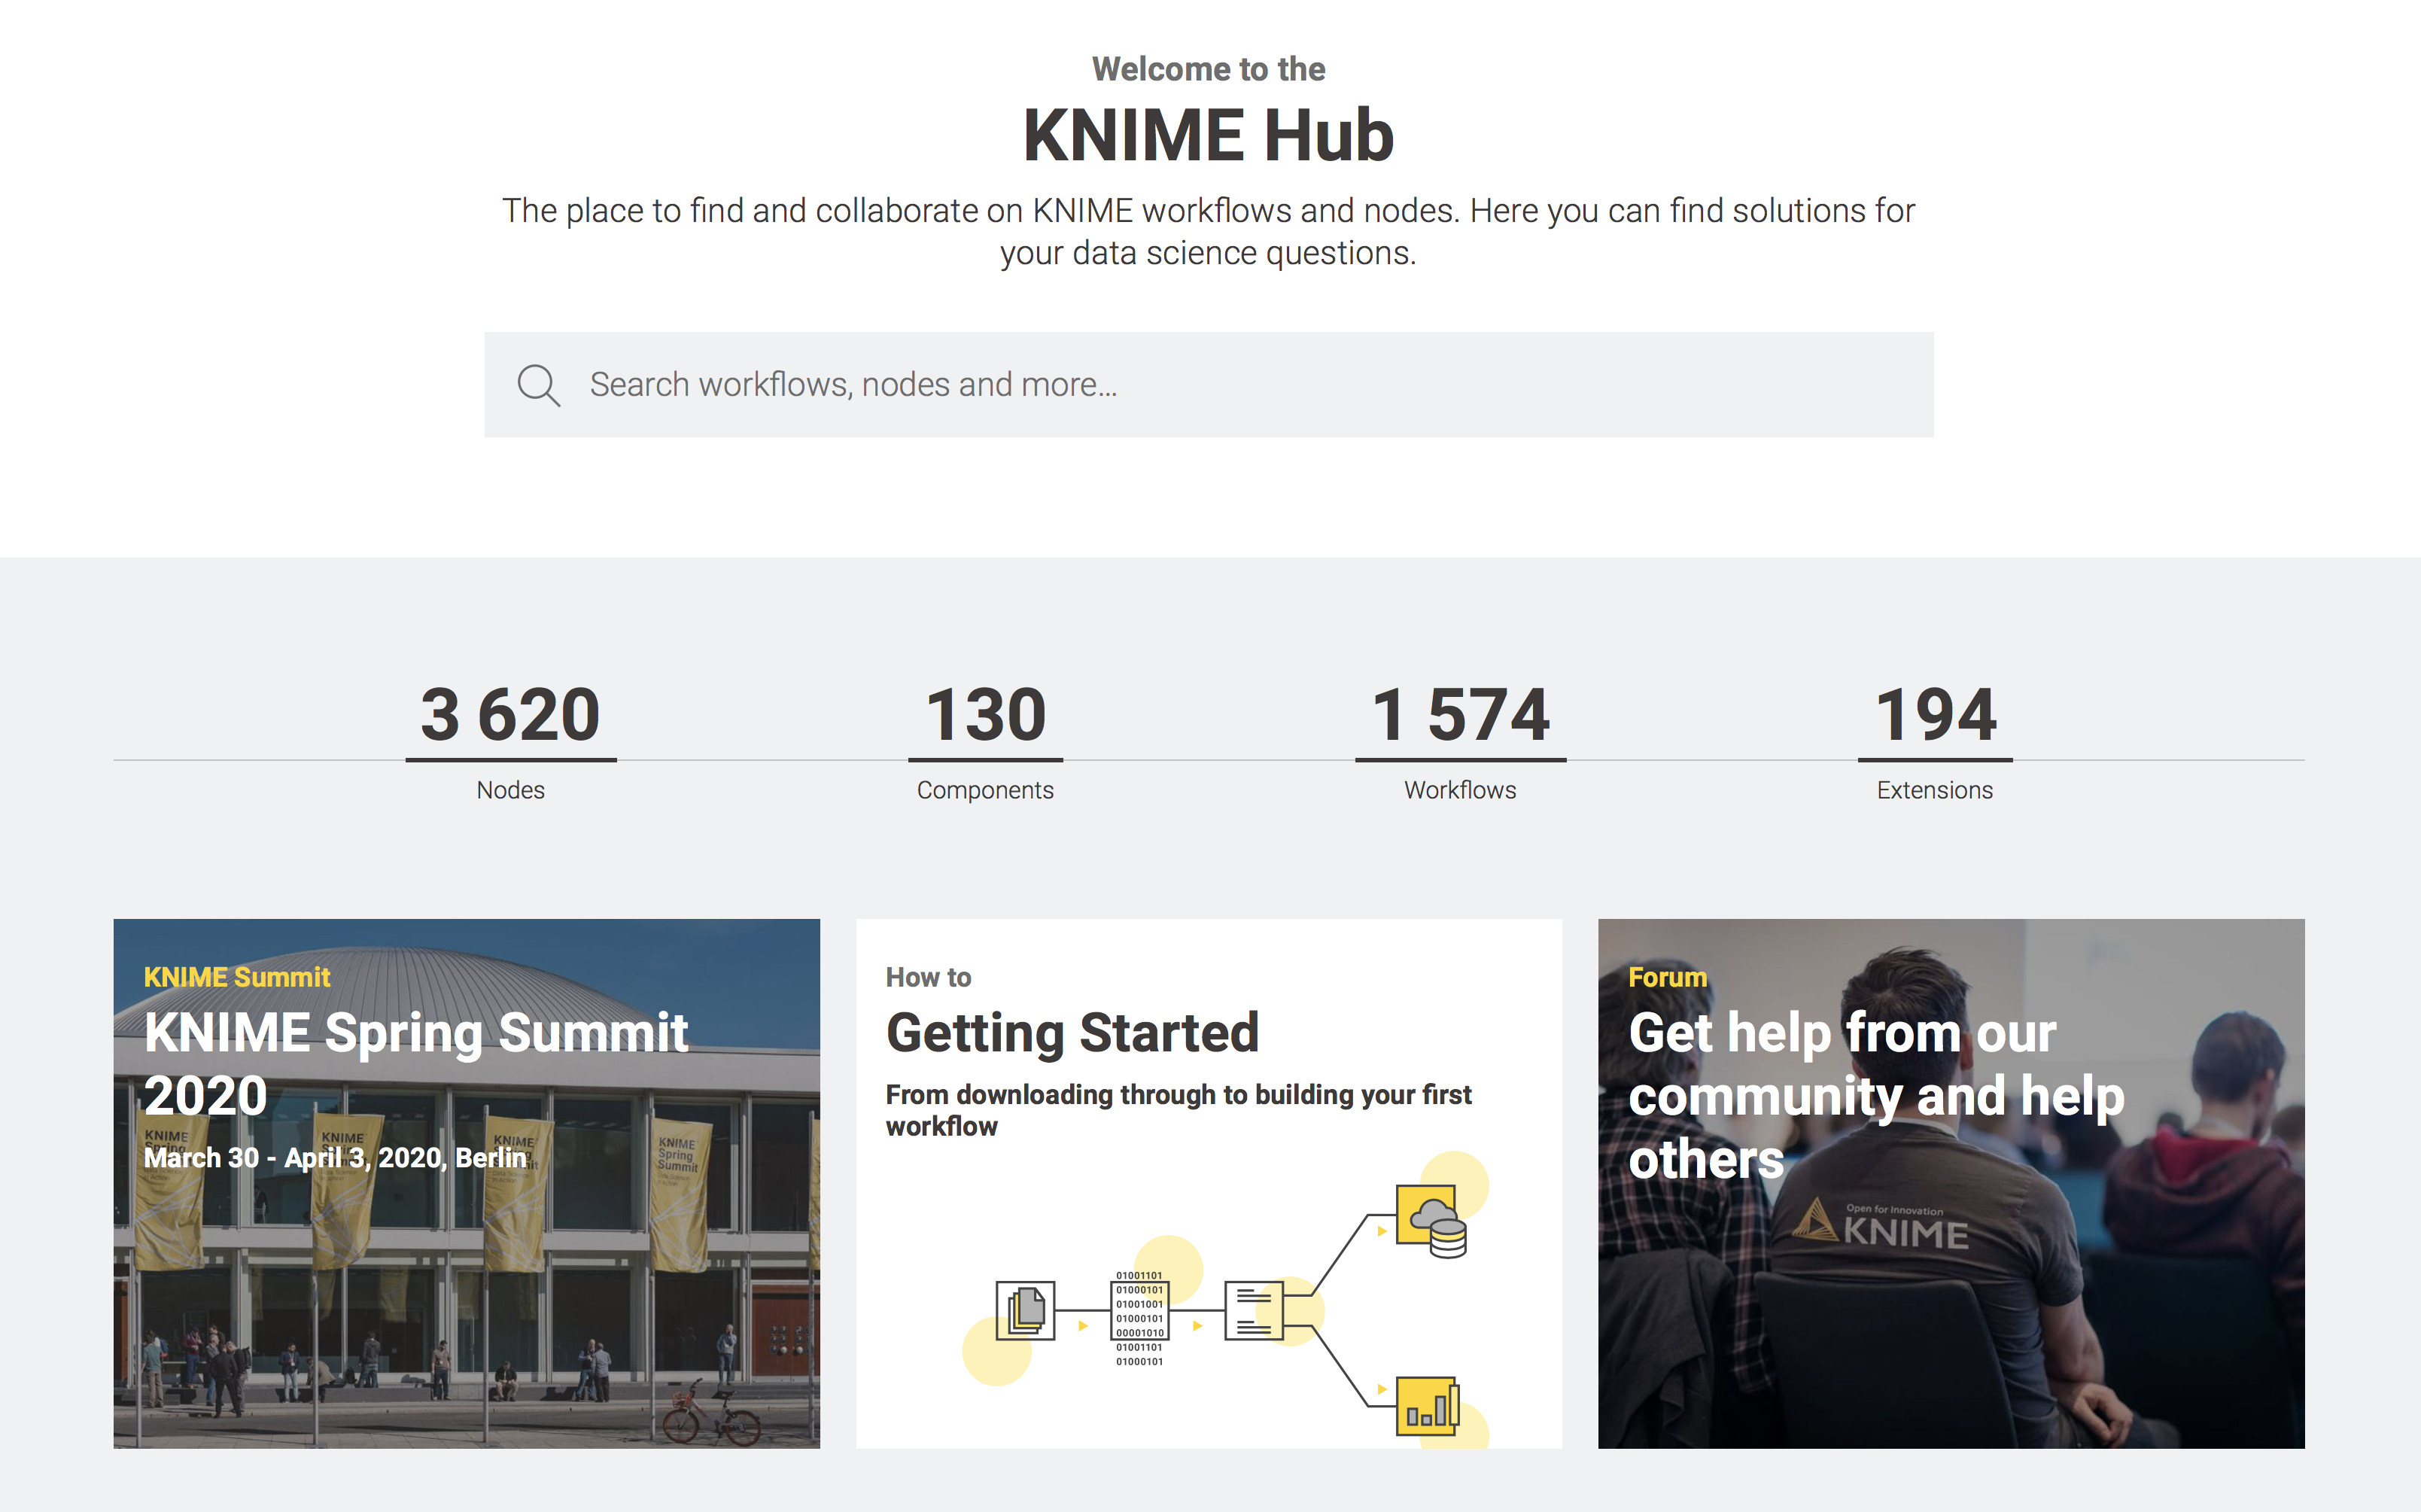 The KNIME Hub